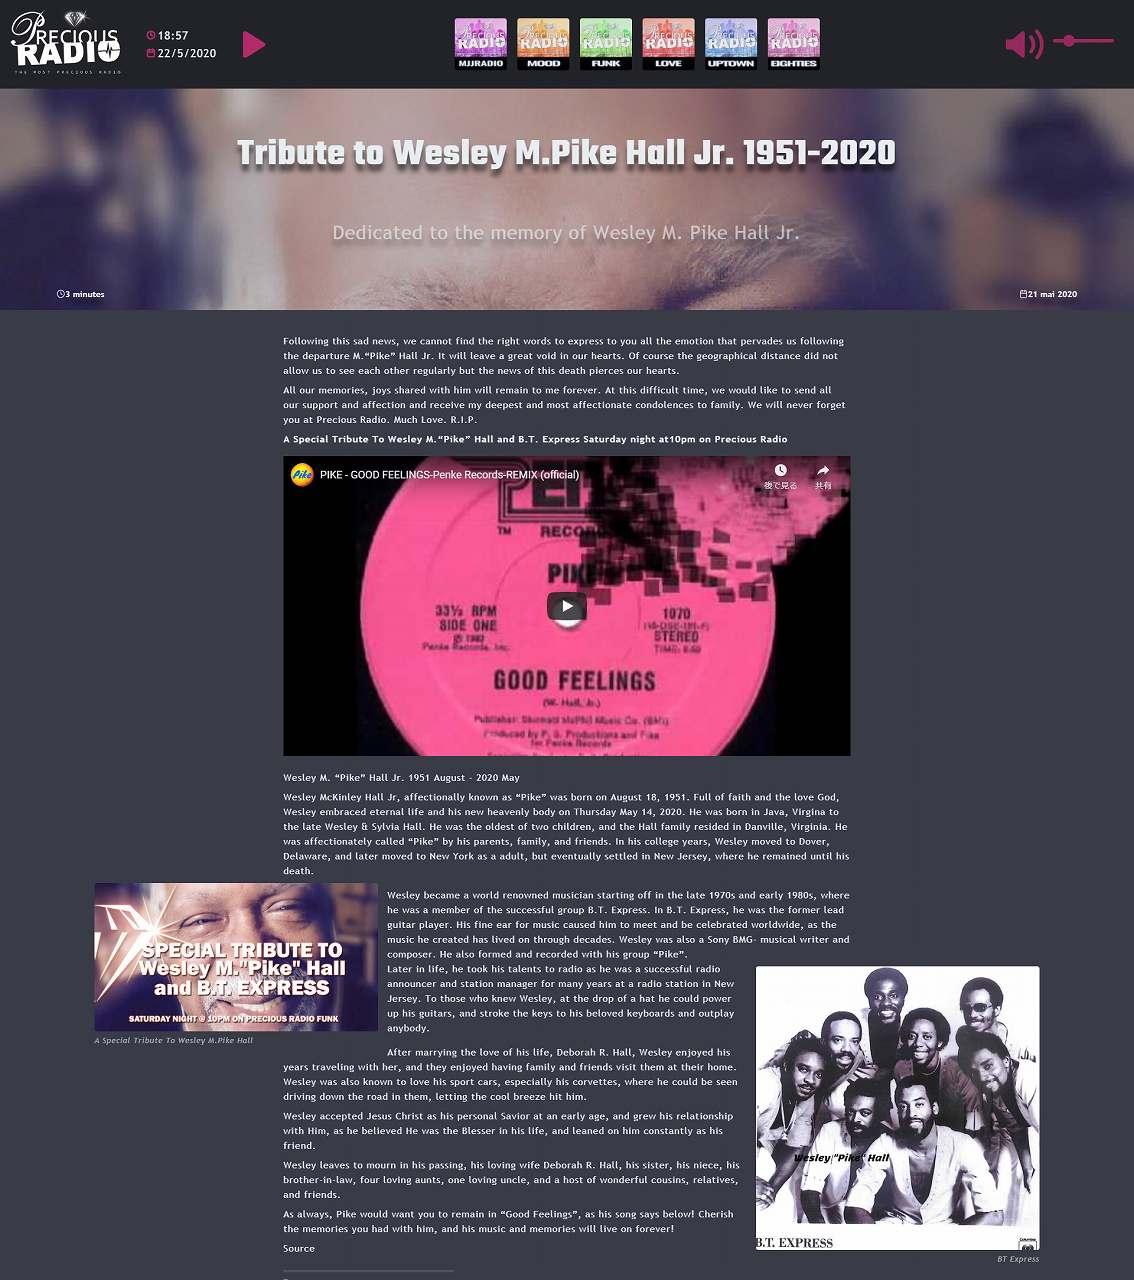 tribute-to-wesley-hall-preciousradio-news.jpg